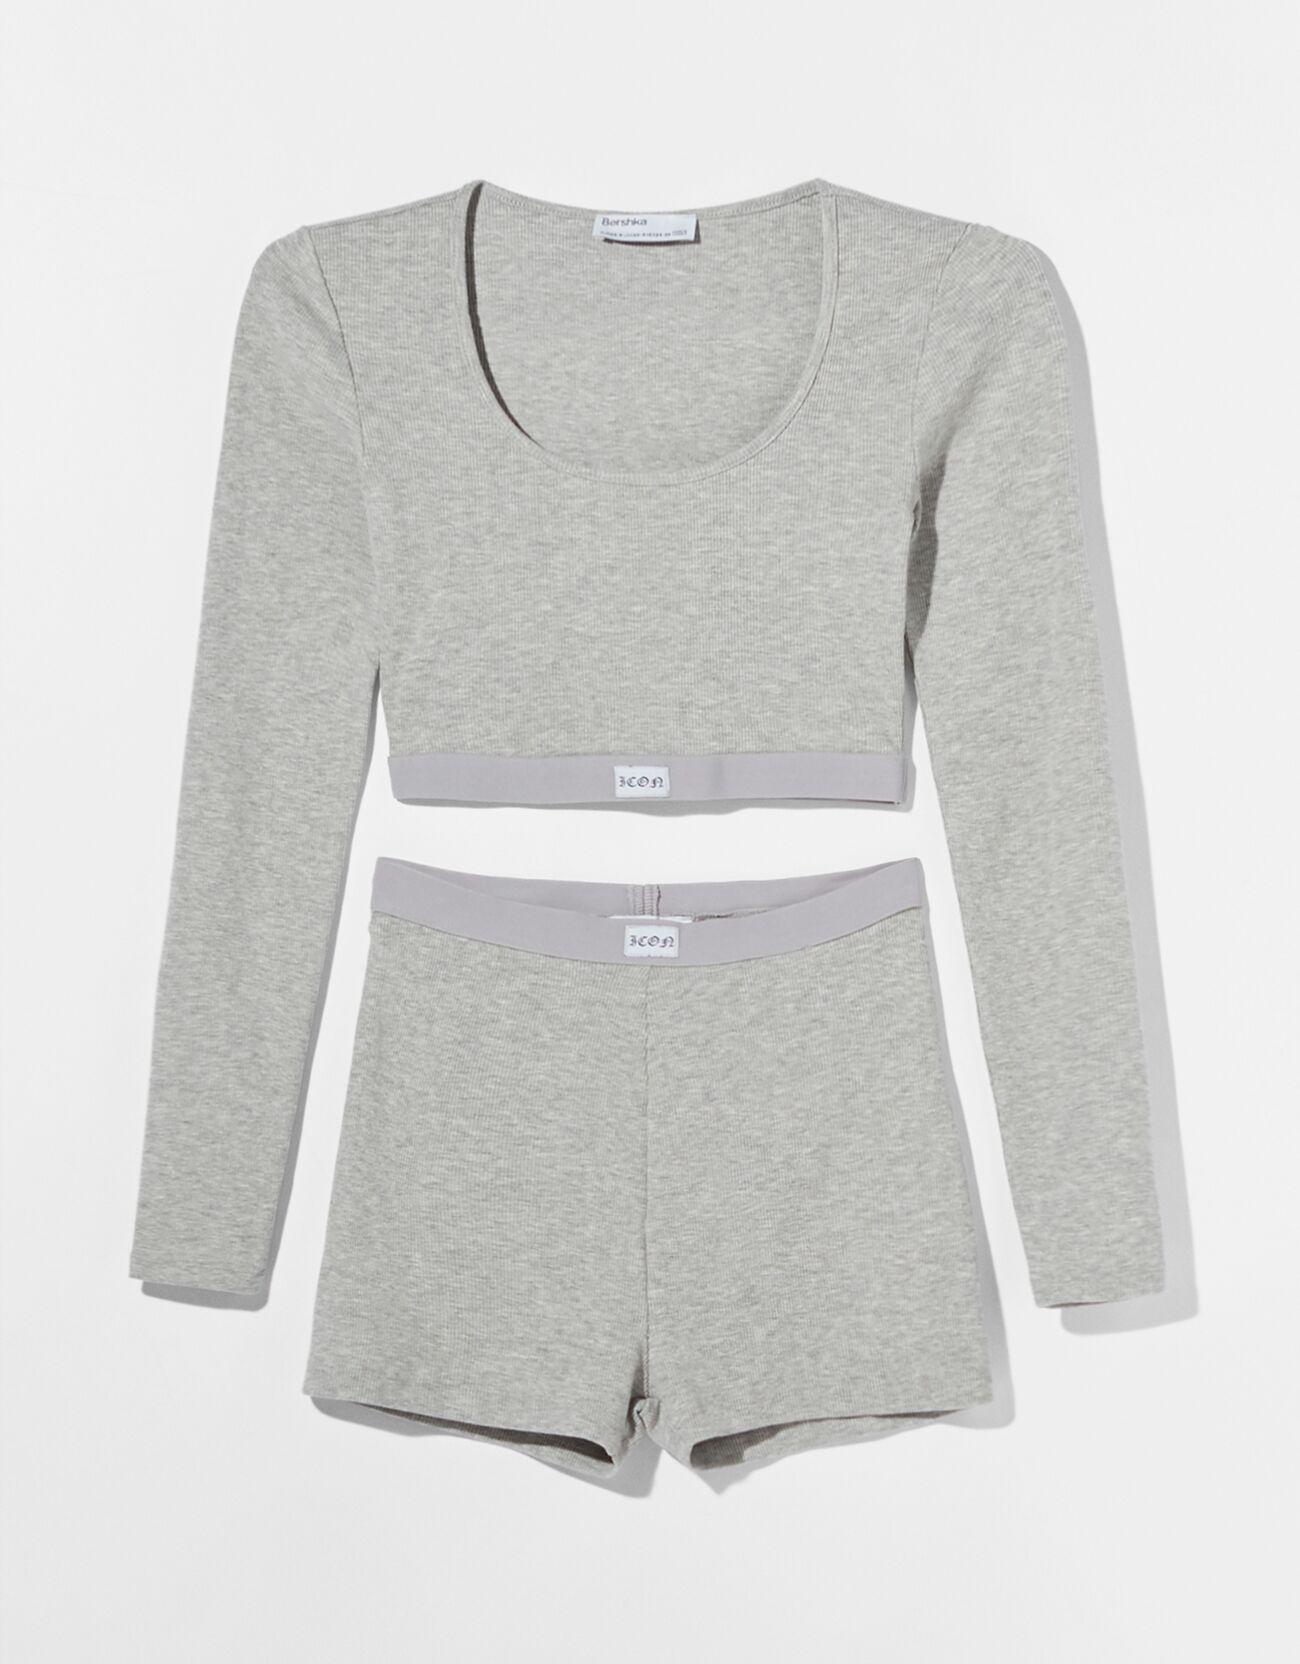 Pijama rib manga larga.